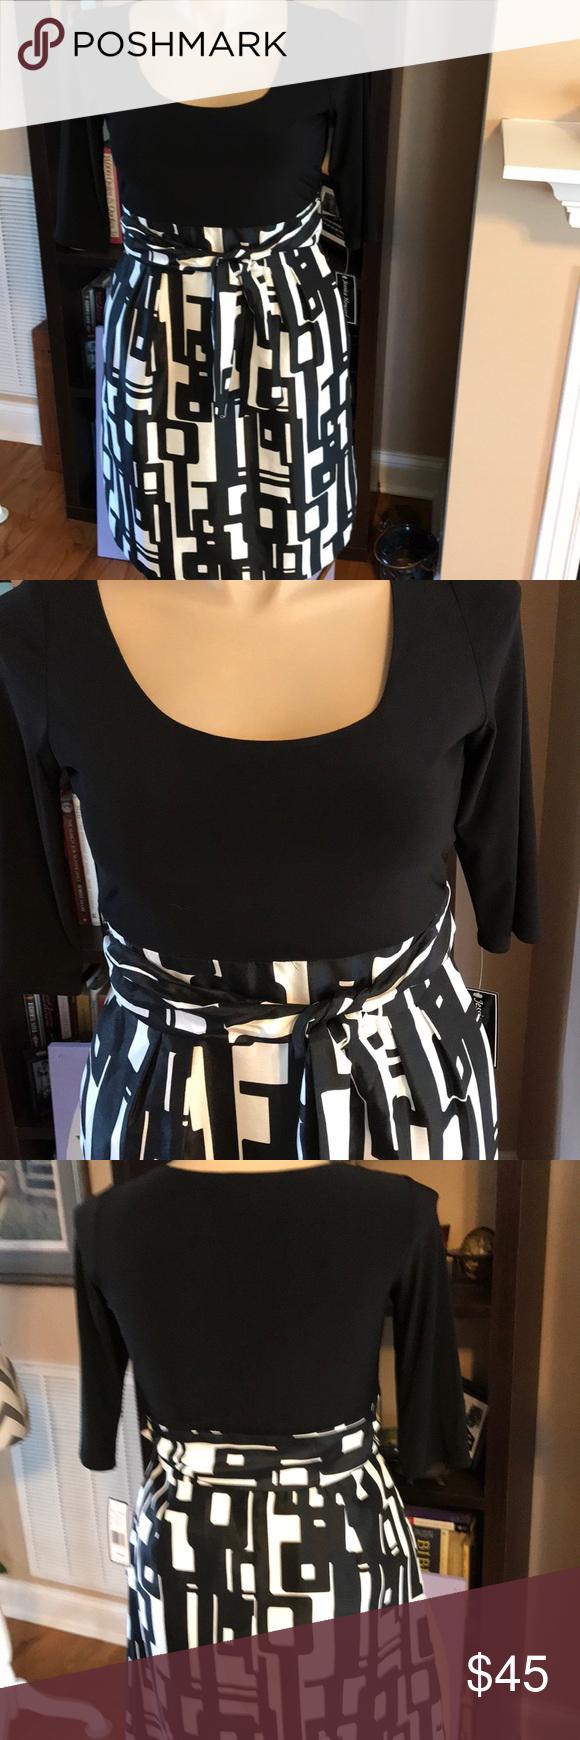 a79081b228746 Jessica Howard Dress Sz 14 Missy NWT Black & Ivory Jessica Howard Dress Sz  14 Missy. The bottom portion is lined. Machine washable. Black & Ivory. NWT.